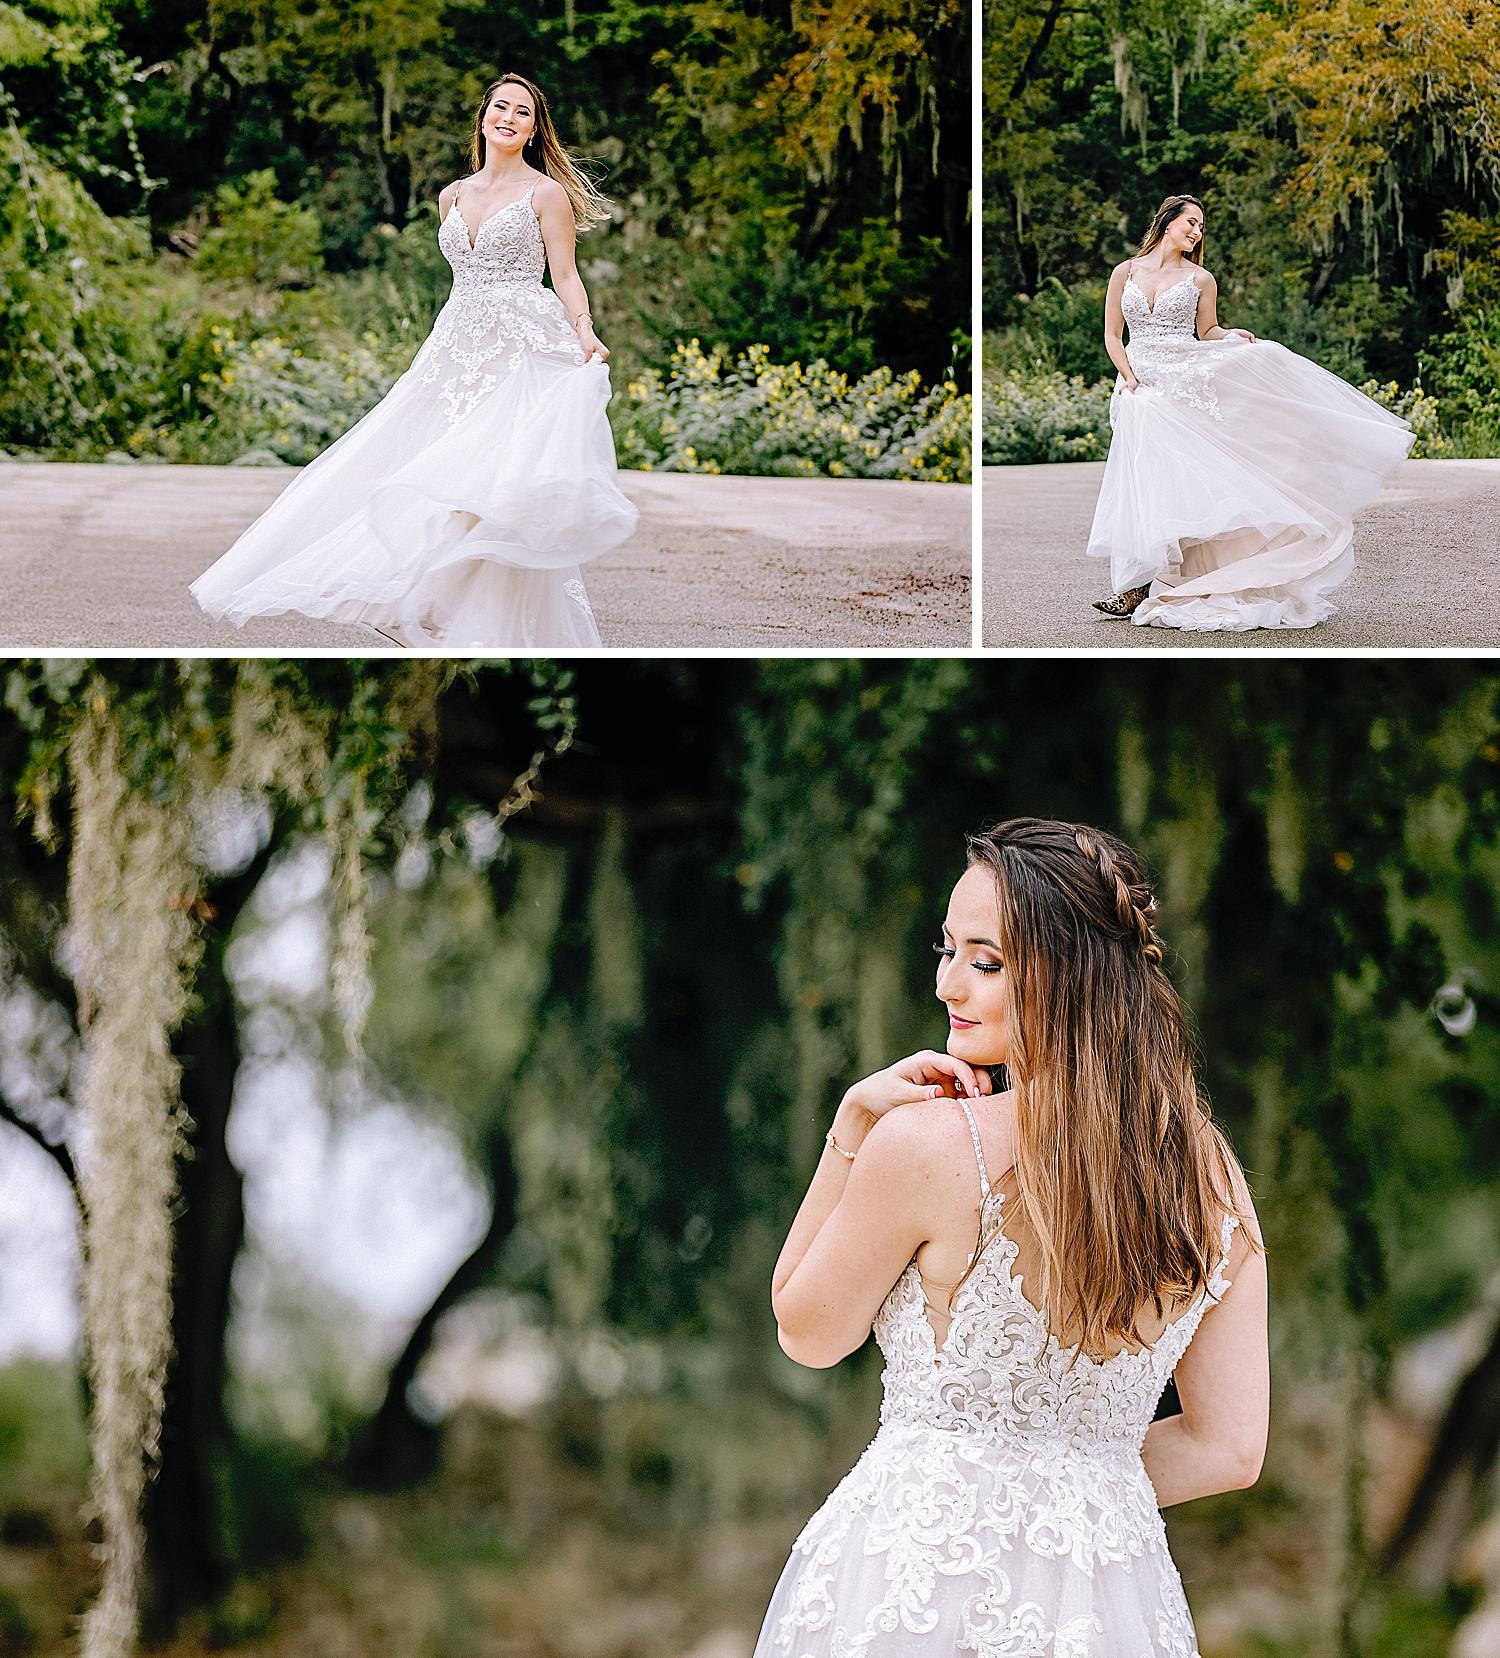 Carly-Barton-Photography-Bridal-Photos-Remis-Ridge-Hidden-Falls-New-Braunfels-Texas-Bride_0004.jpg